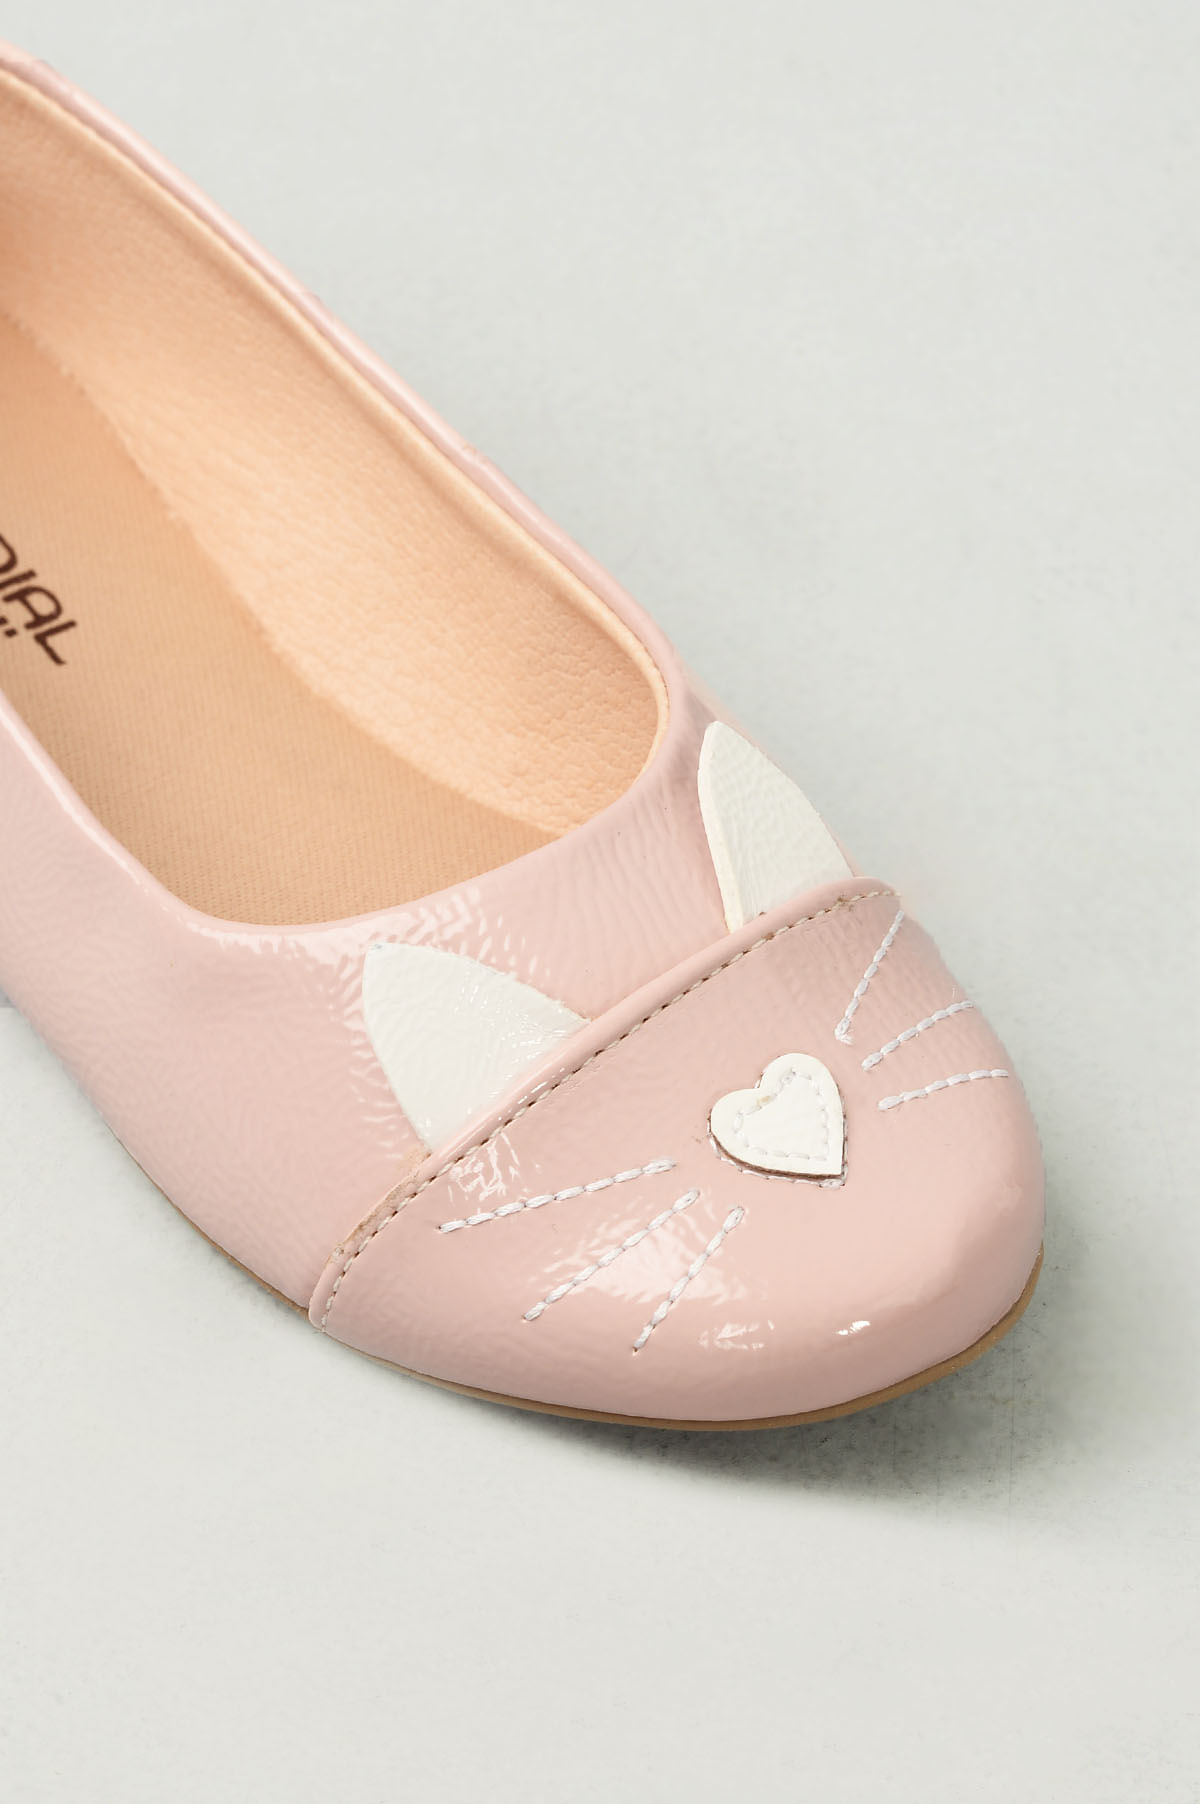 90e2fd1d6 Sapatilha Infantil Julye Mundial VERNIZ - NUDE - Mundial Calçados